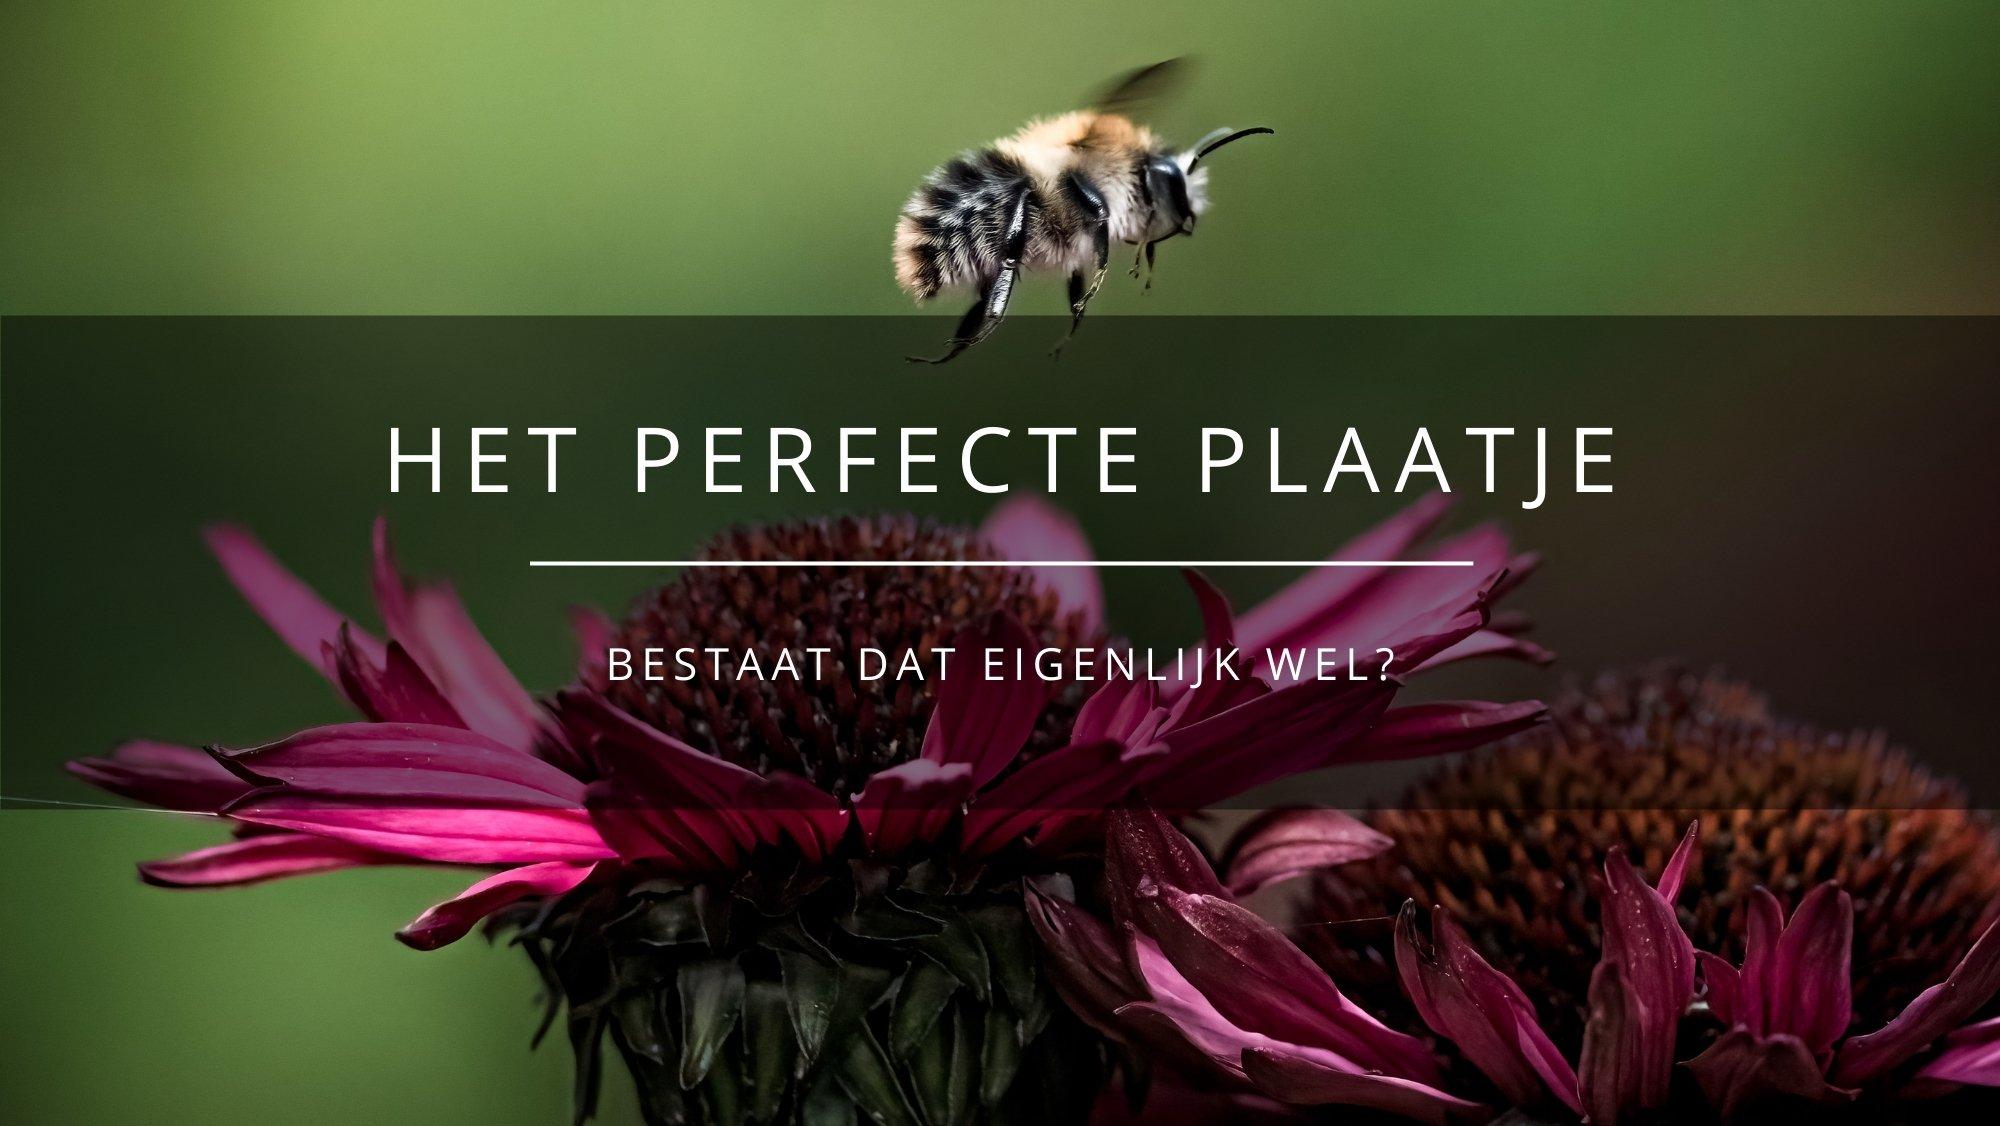 https://arnhemsmeiske.nl/lege-ruimte/